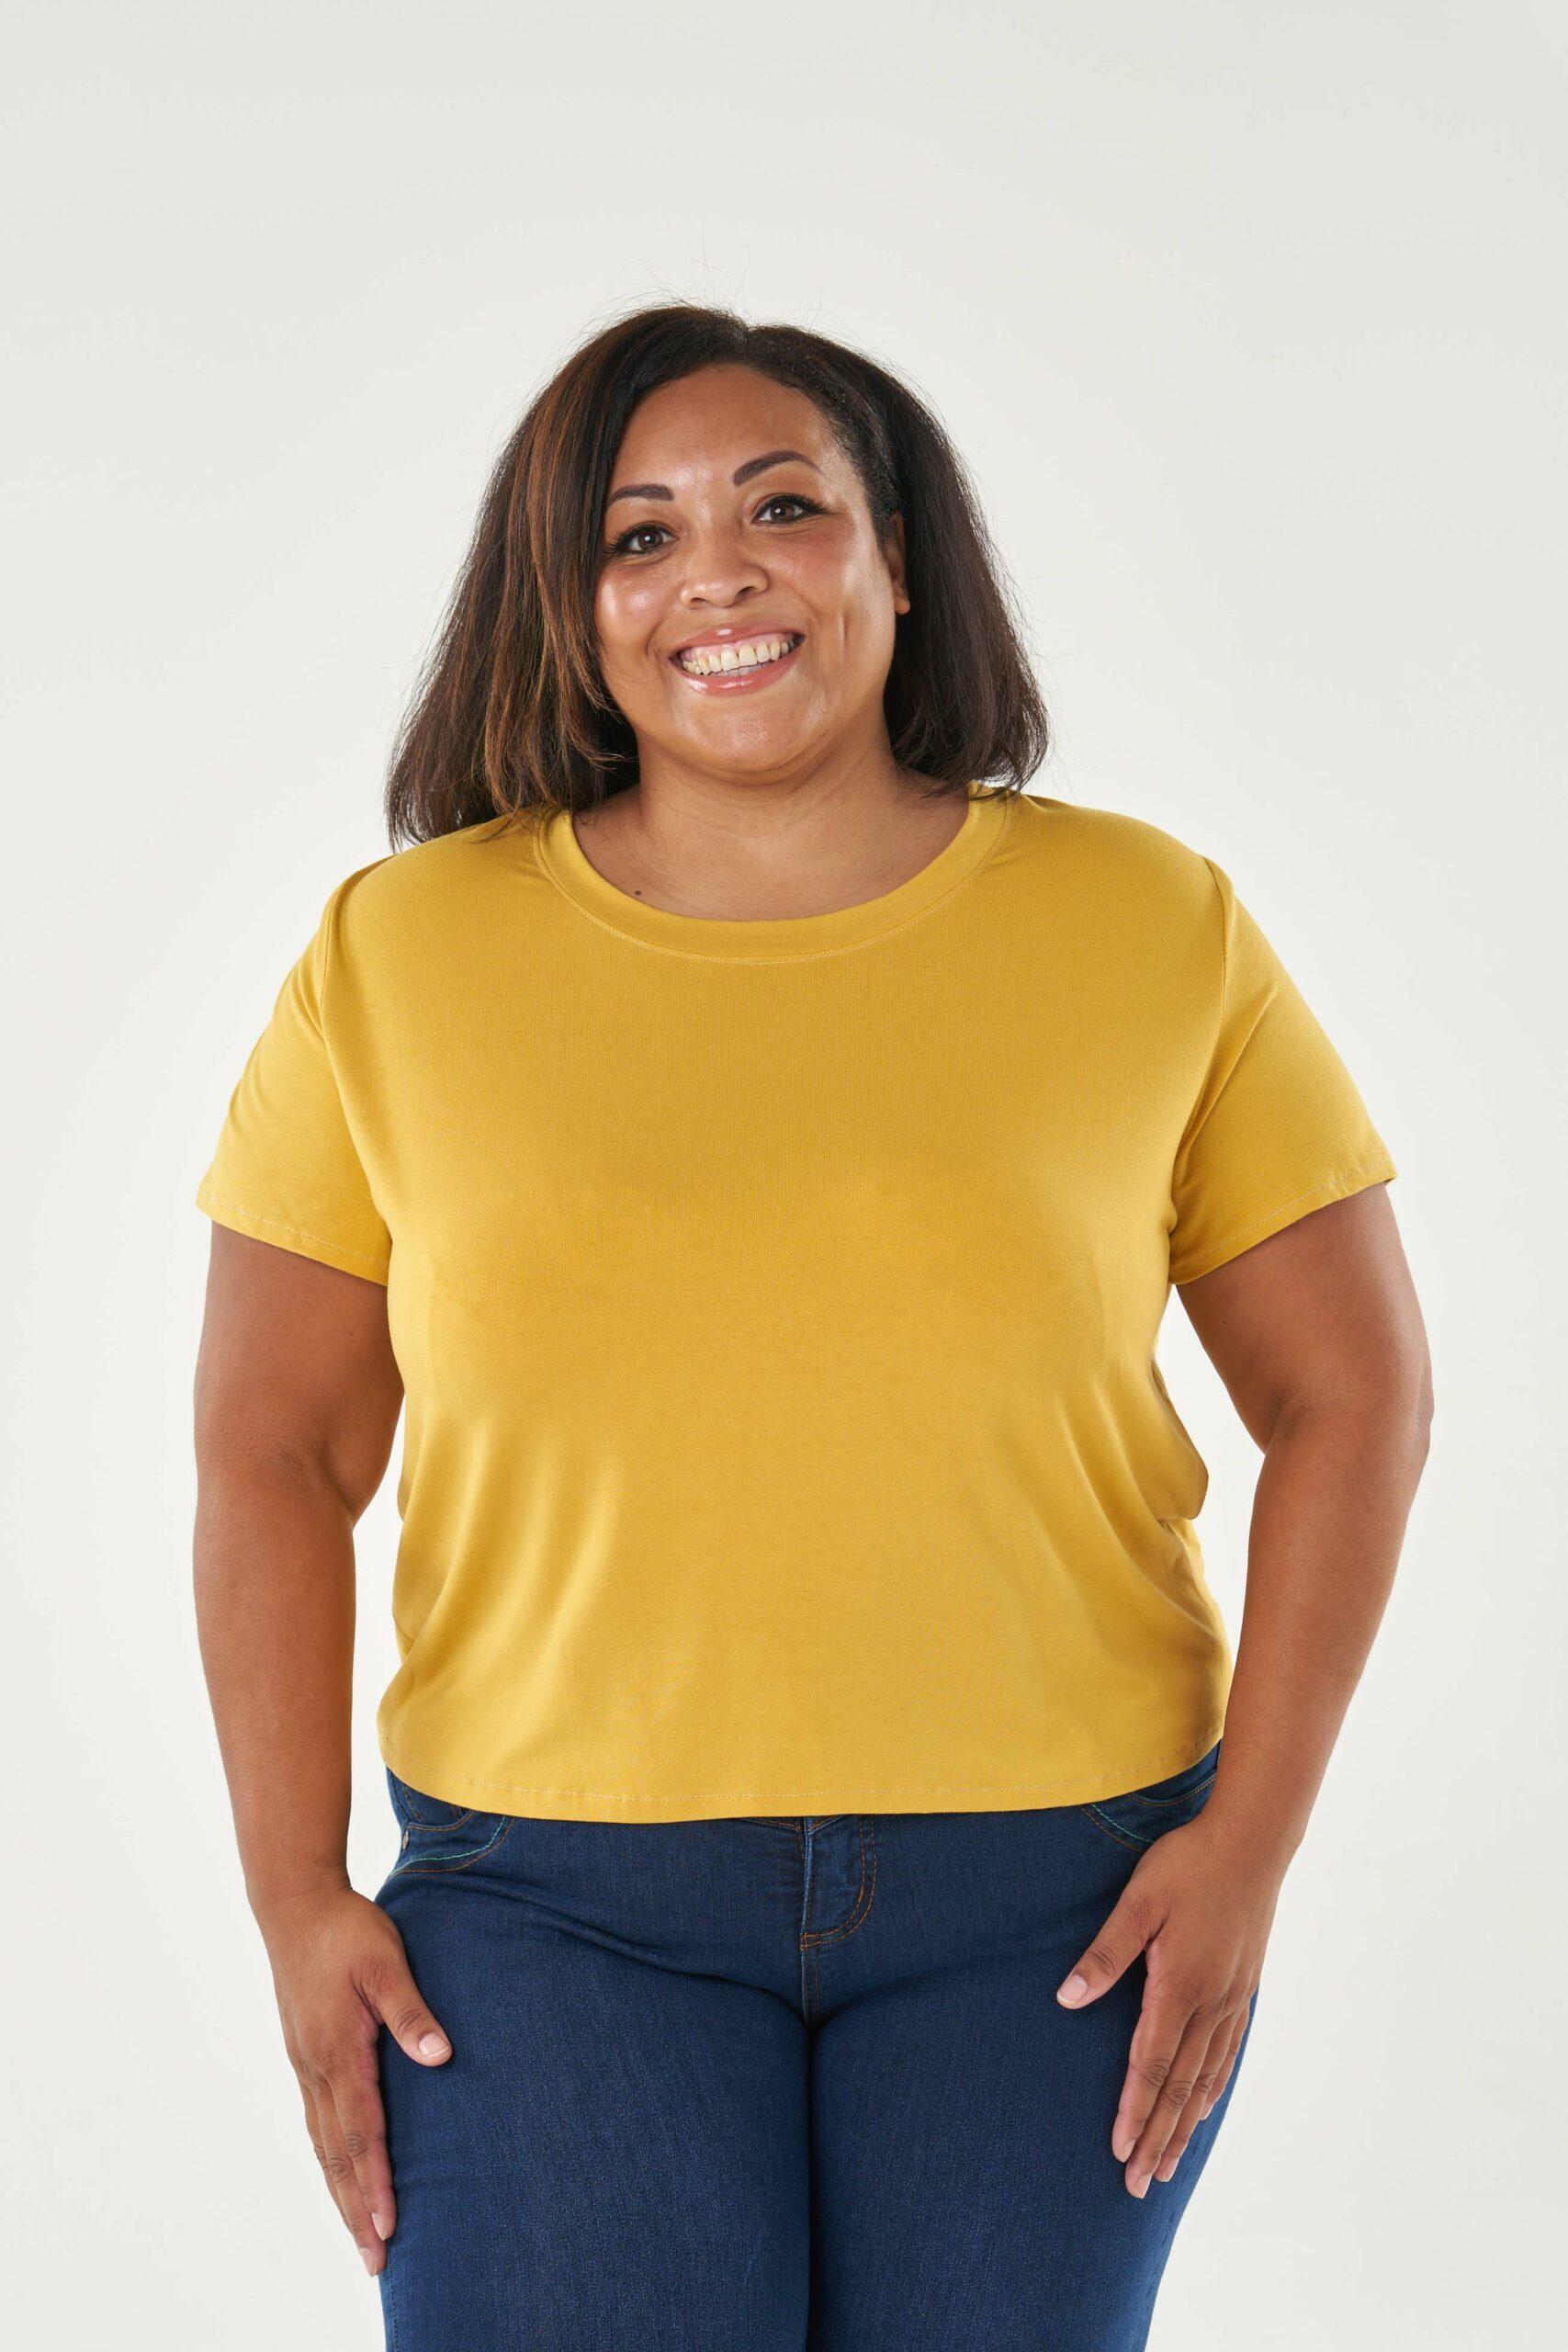 Sew Over It - Beginner T-shirt